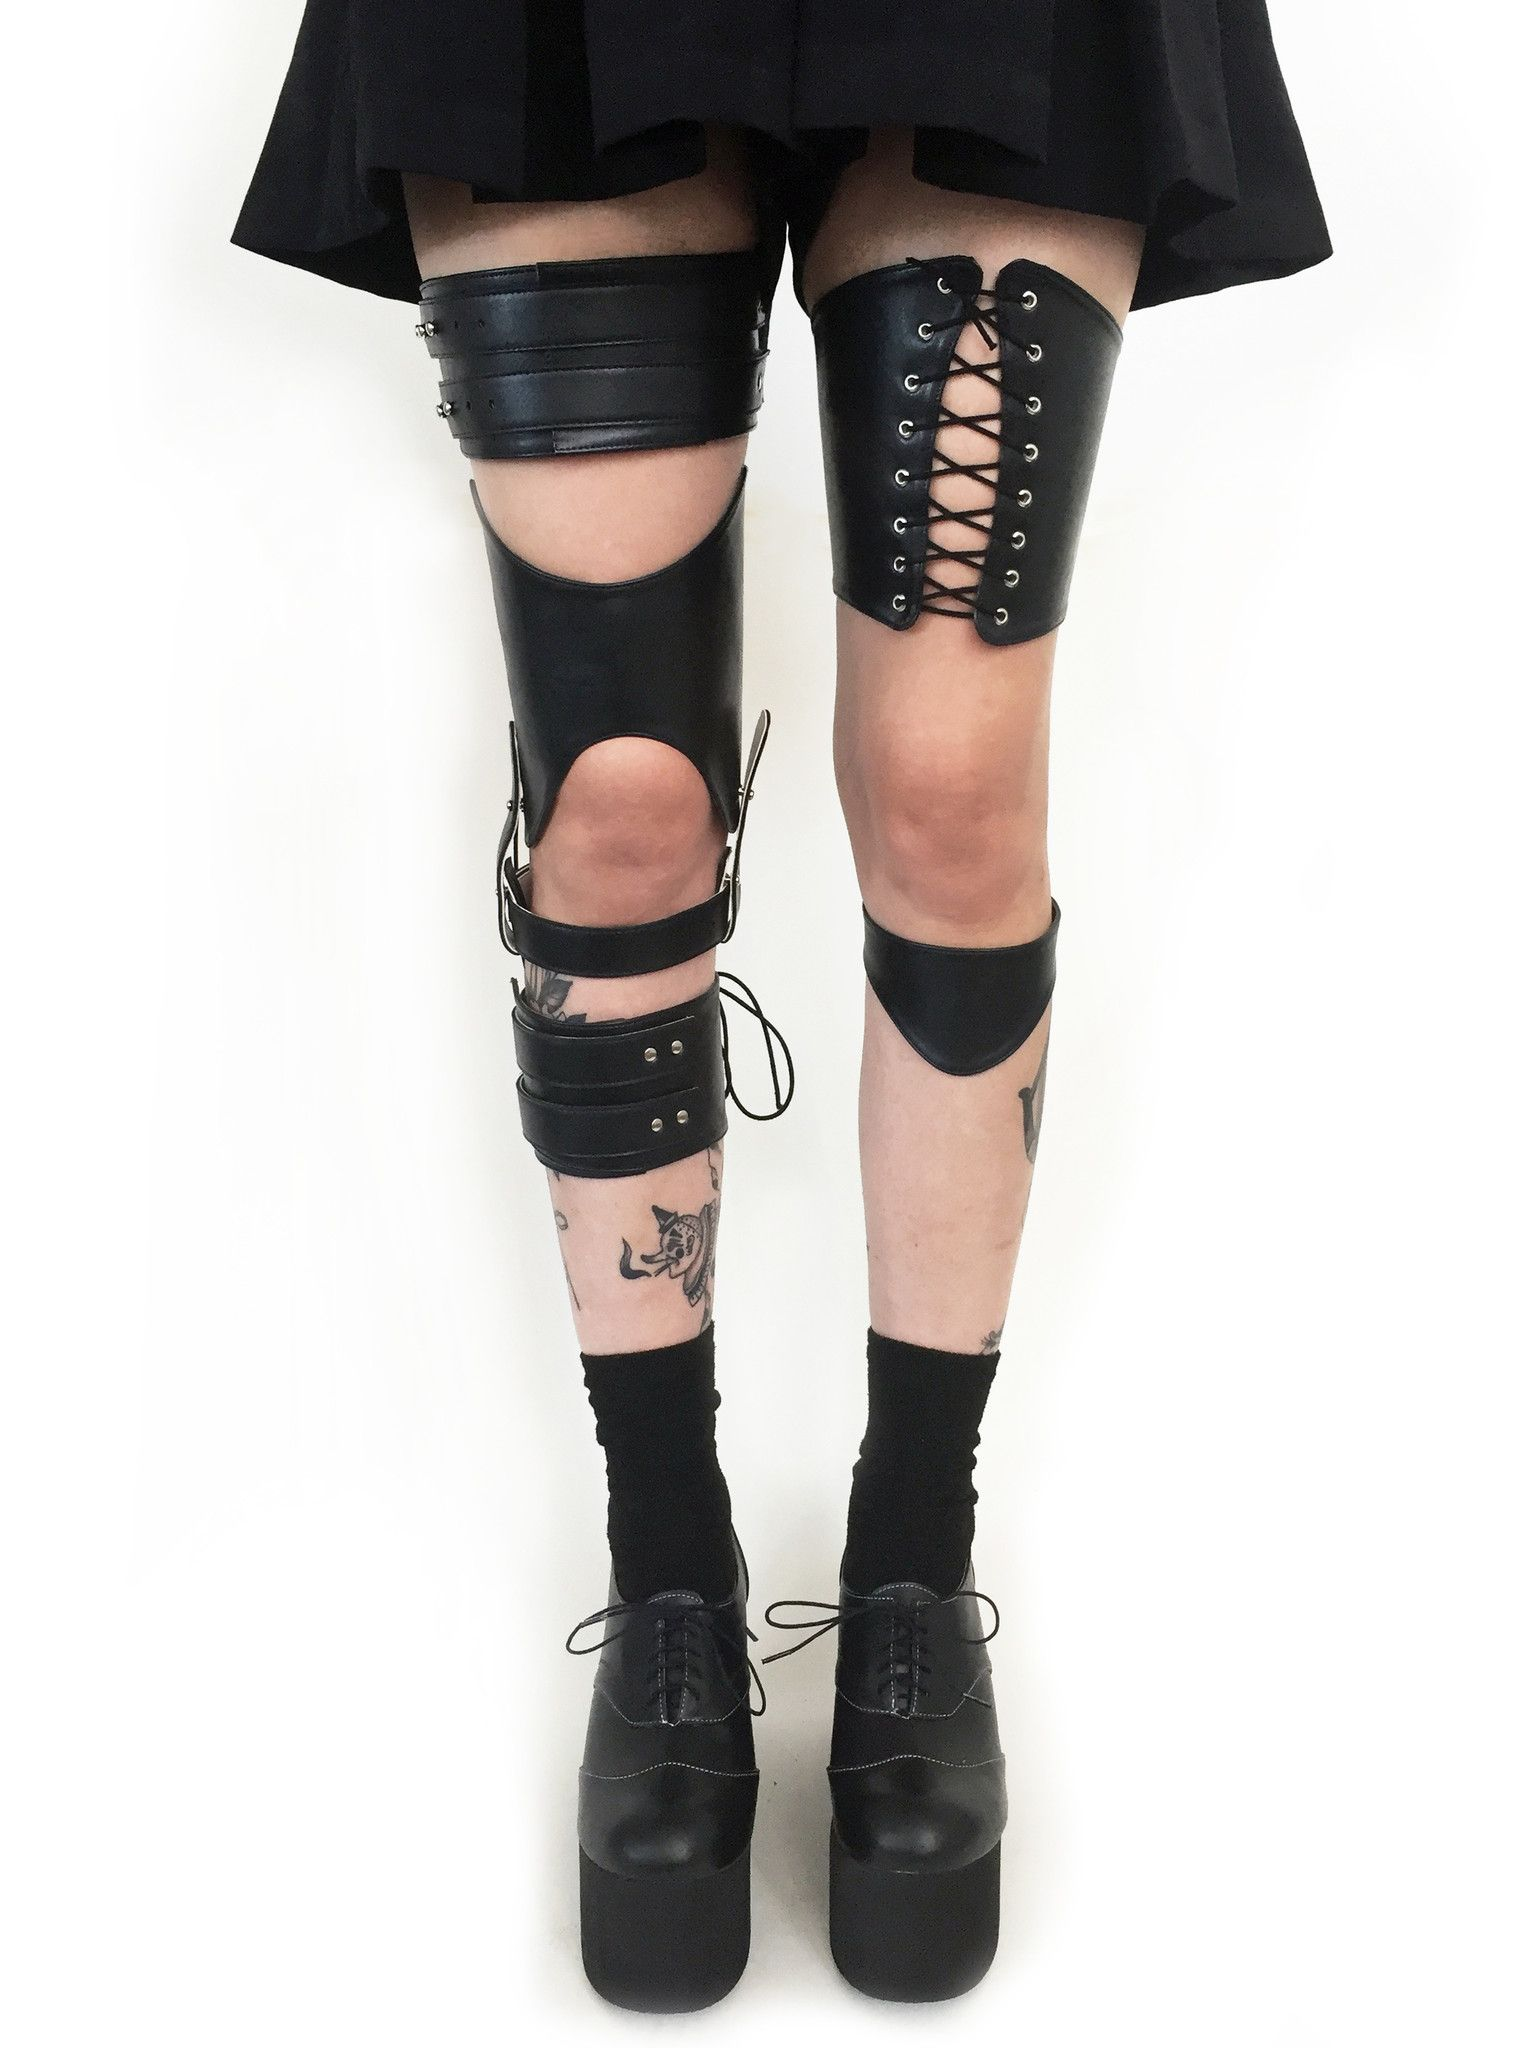 2cafd3c0997 Deandri leg harness   knee brace   thigh brace